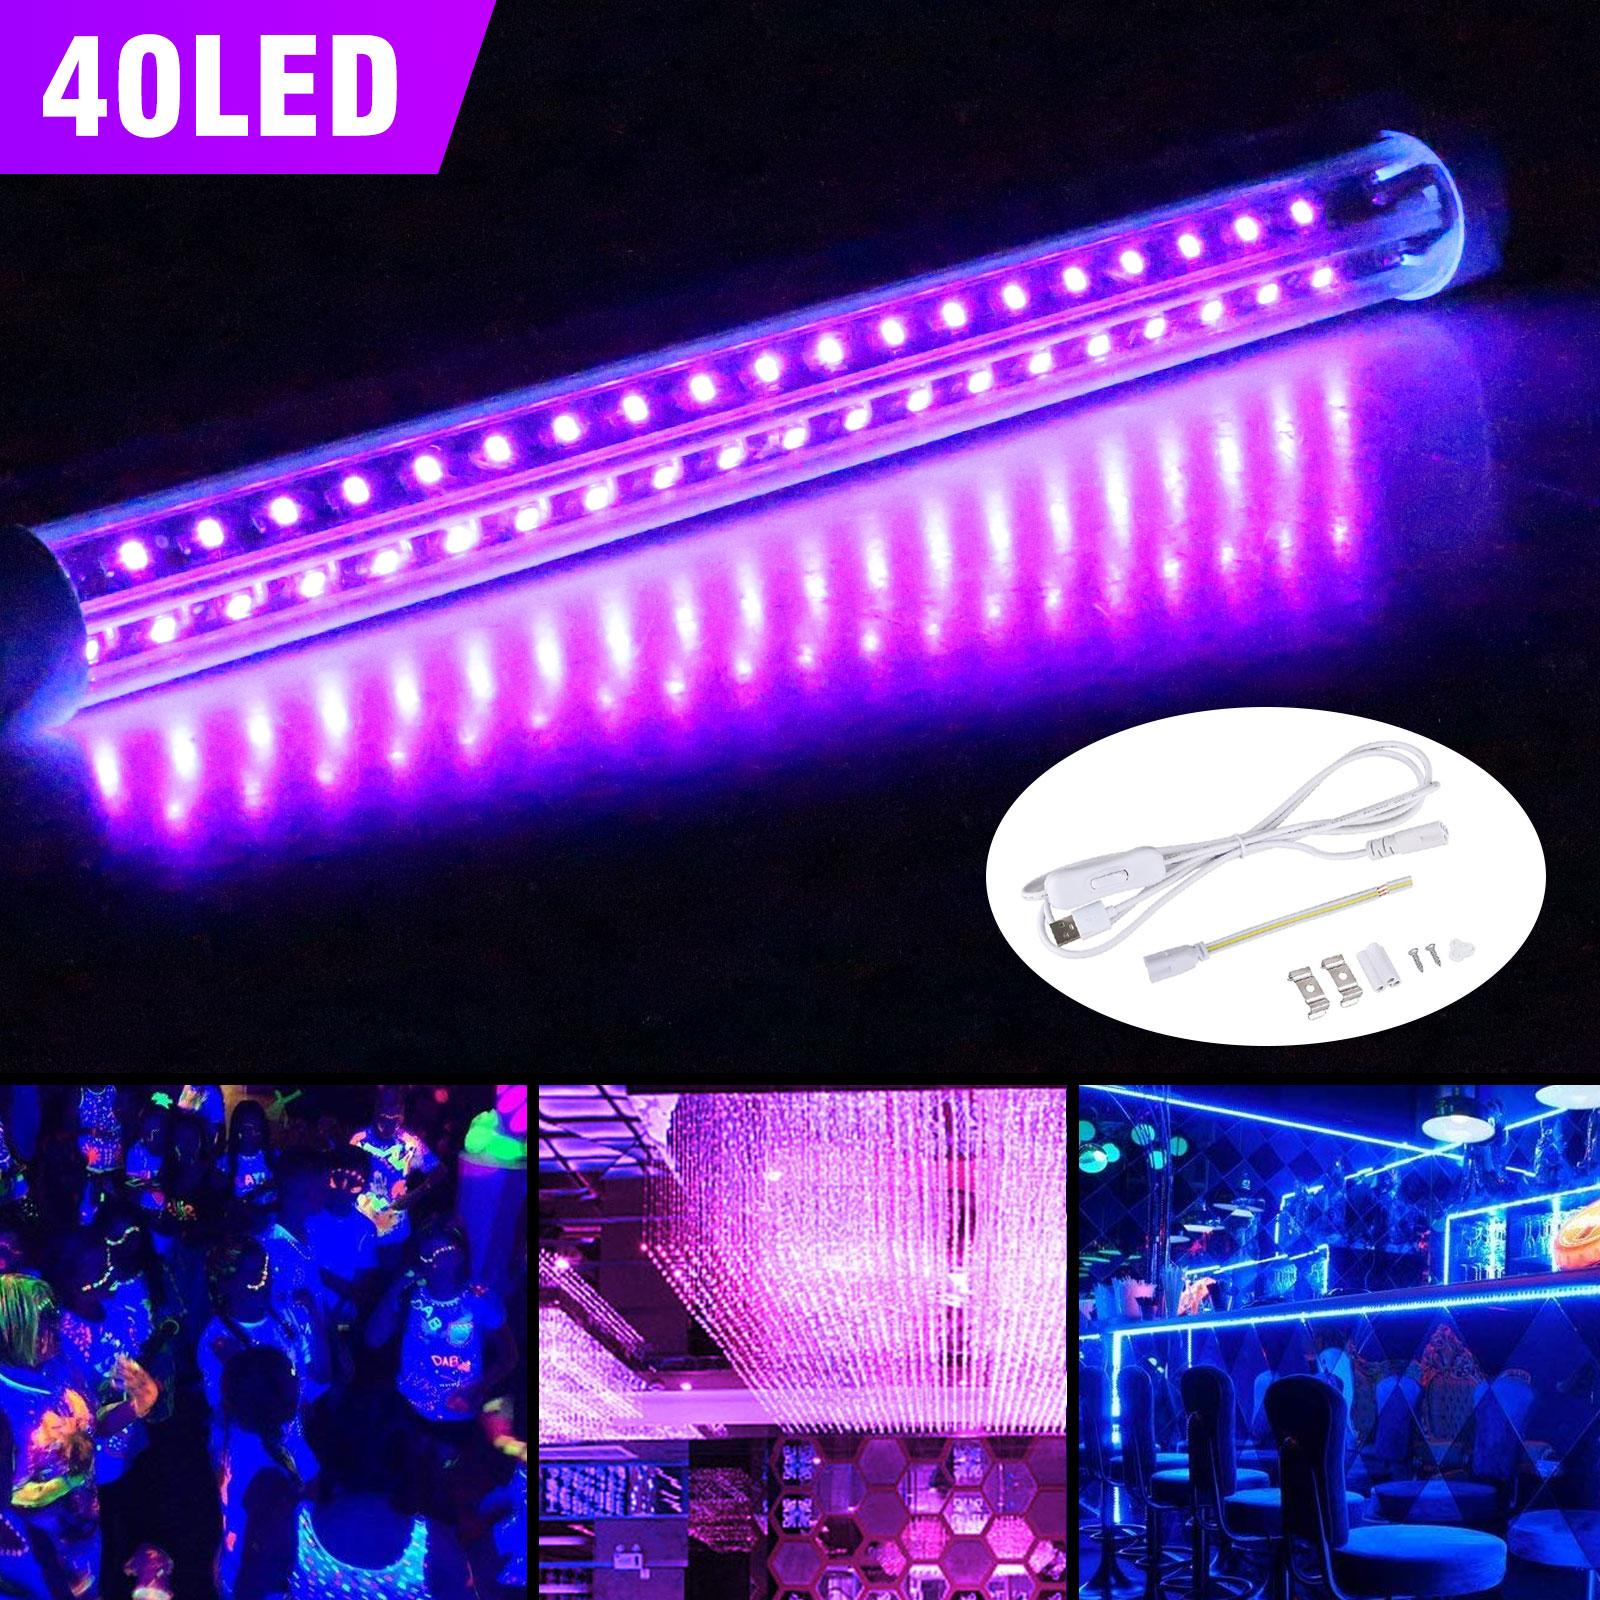 US 10W 40 LED 5V UV Ultraviolet Strip Tube Light Bar USB Par